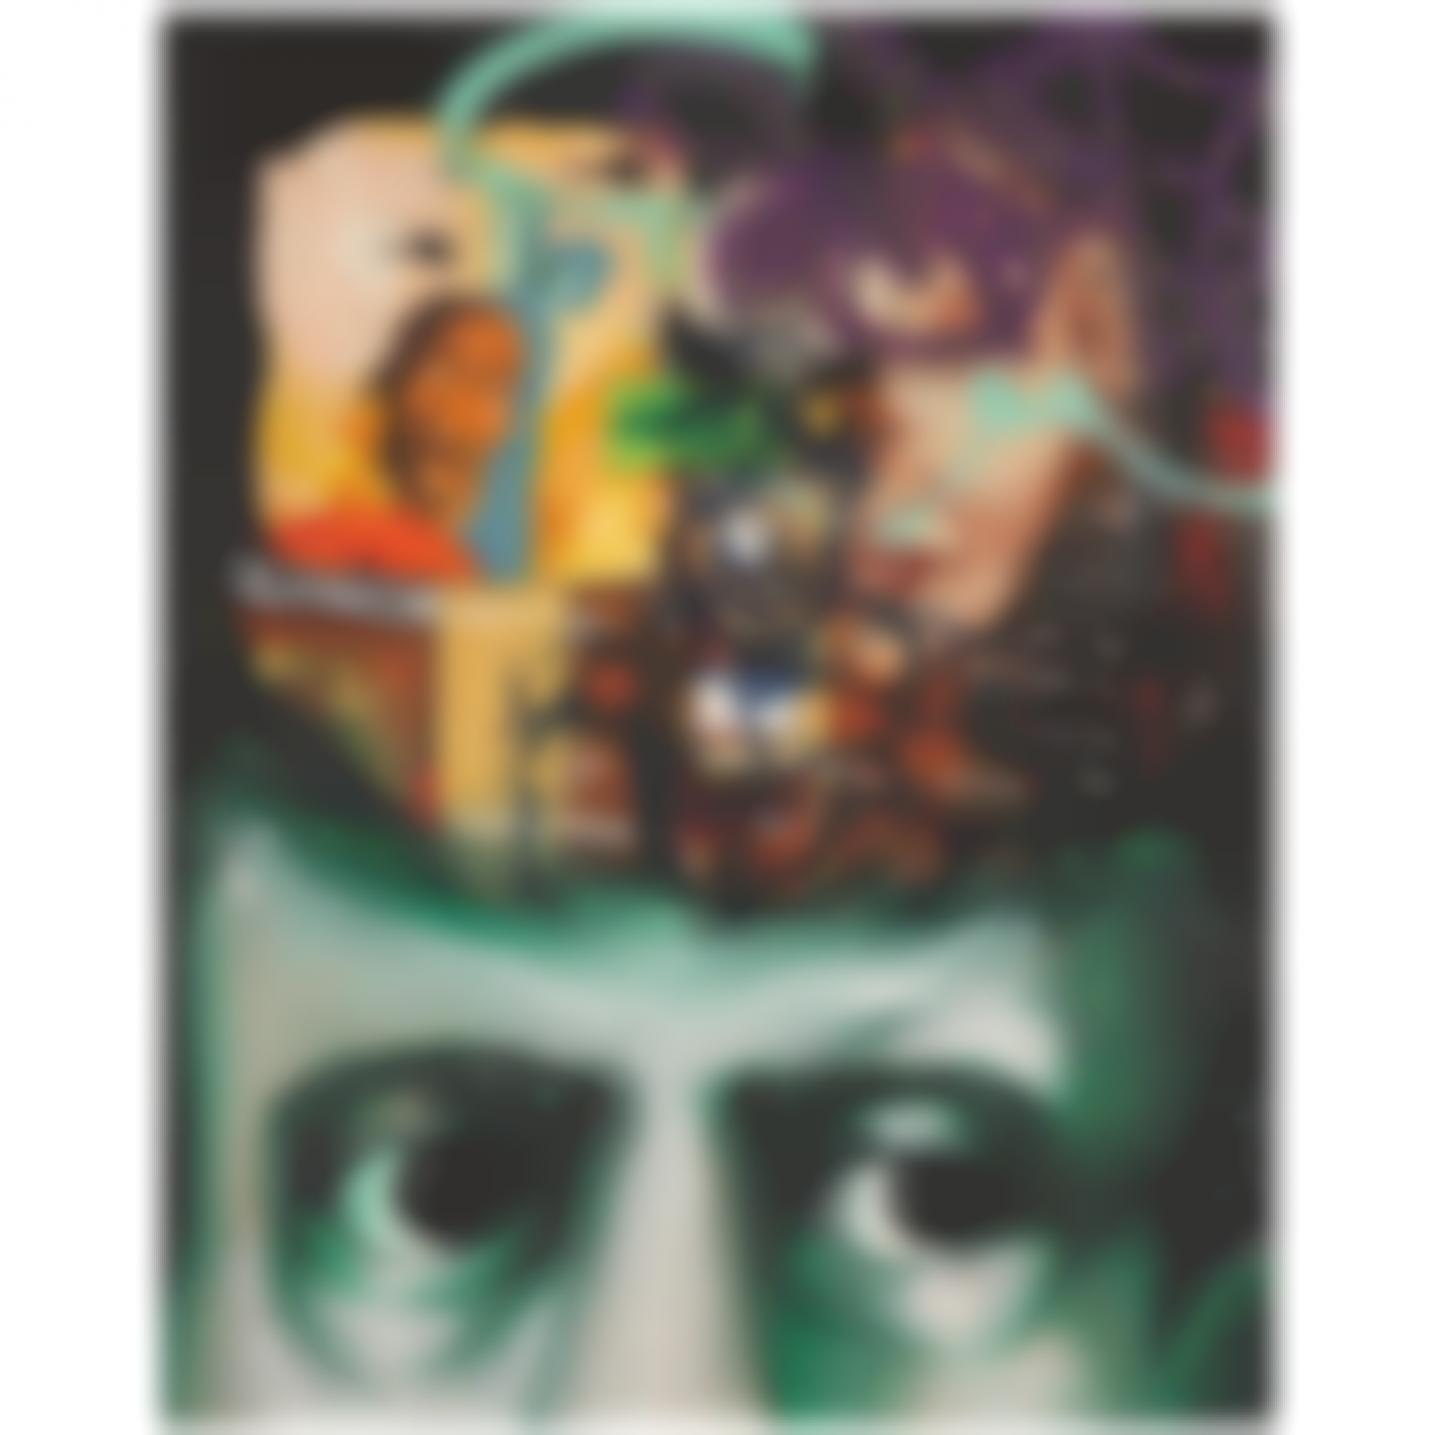 Daze-My Mind-1987